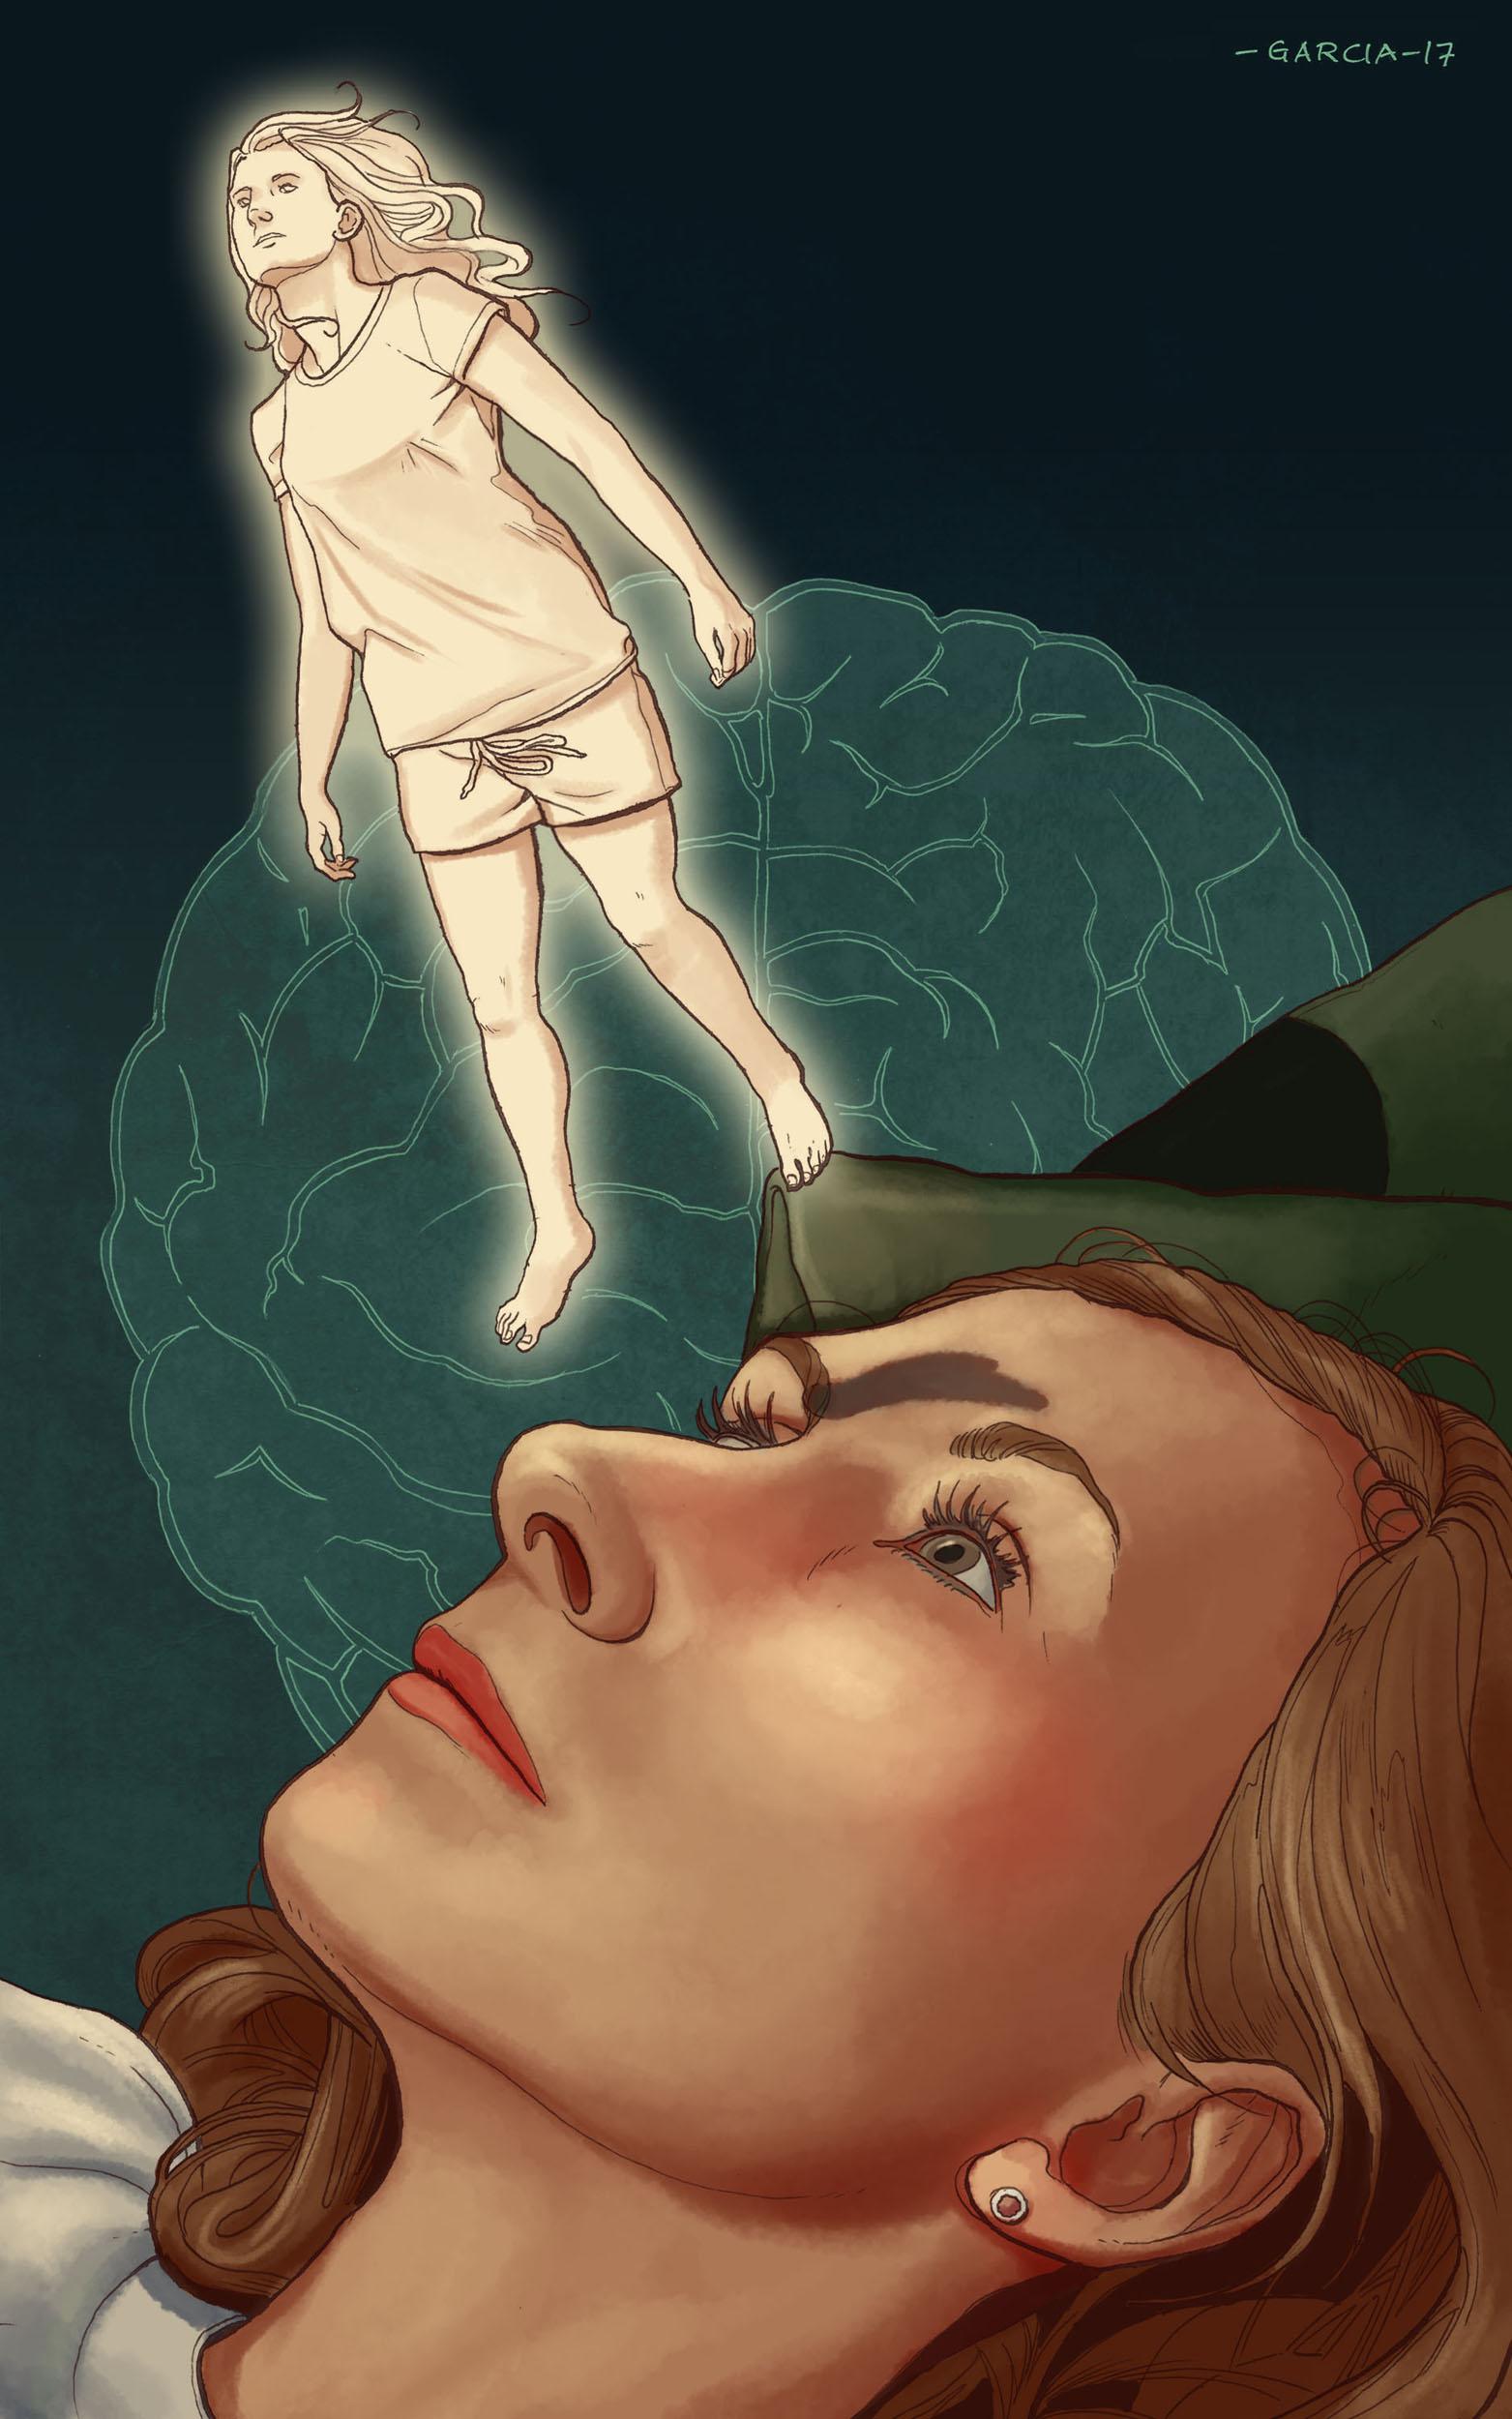 Daniel Garcia Art Illustration Editorial Principia Out of Body Experience 01